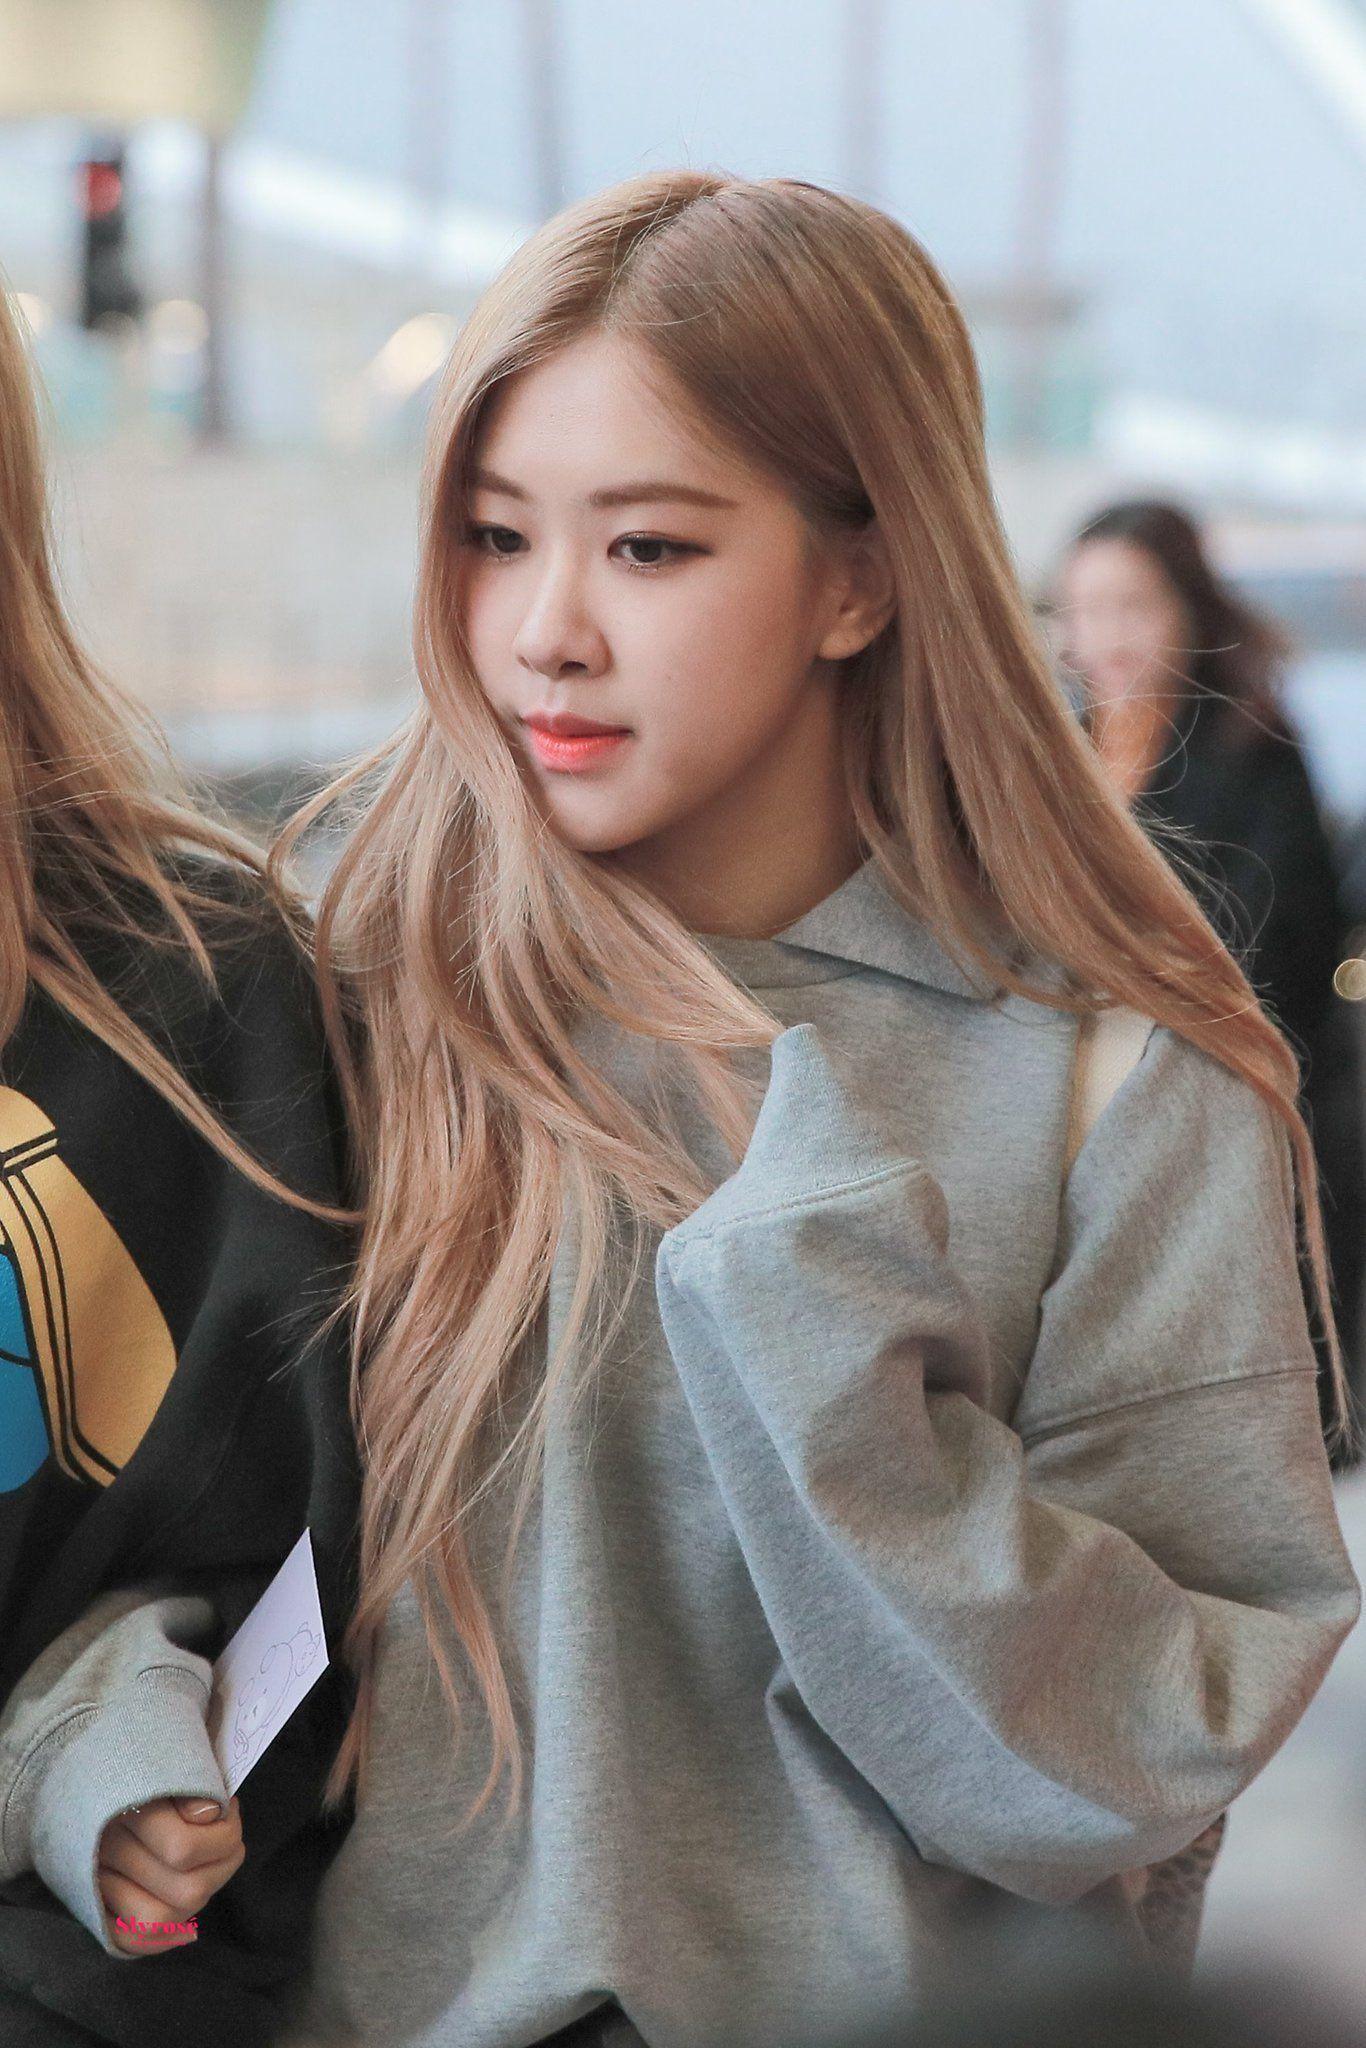 Rose Pics On Twitter Kpop Hair Color Rose Blonde Rose Blonde Hair